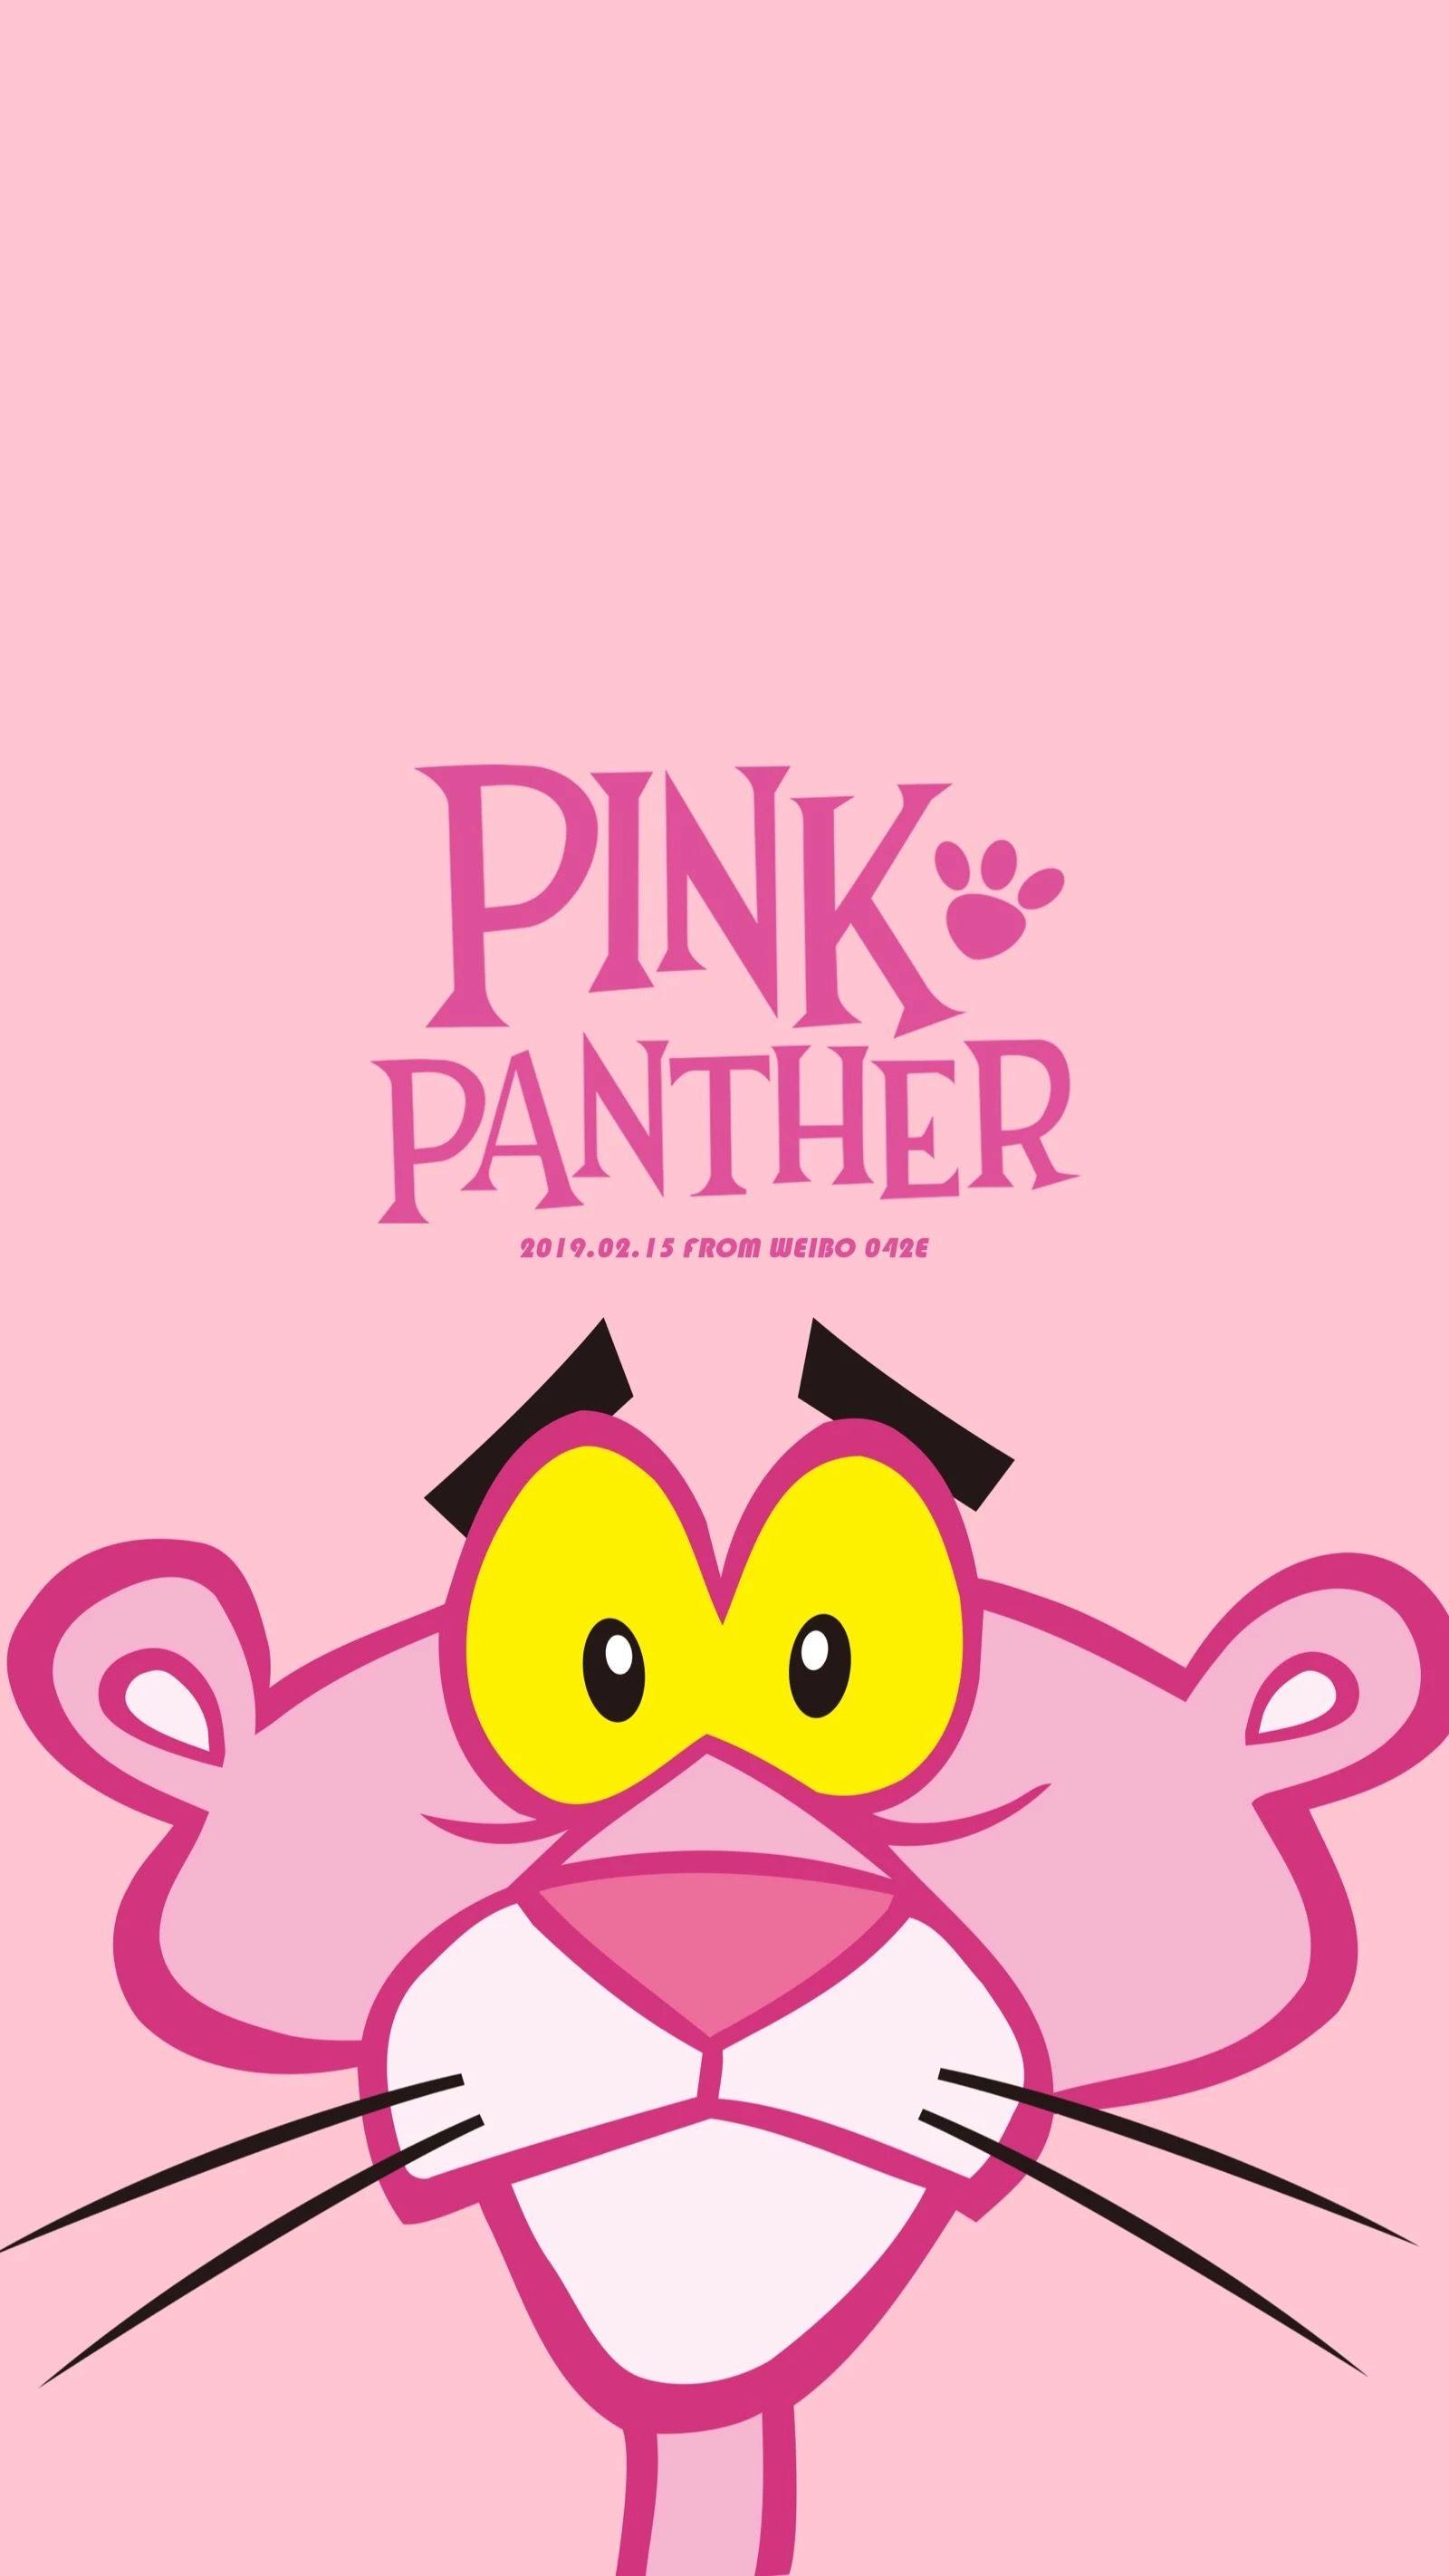 Pink Panther Wallpaper Pink Panther Cartoon Pink Panthers Pink Panter